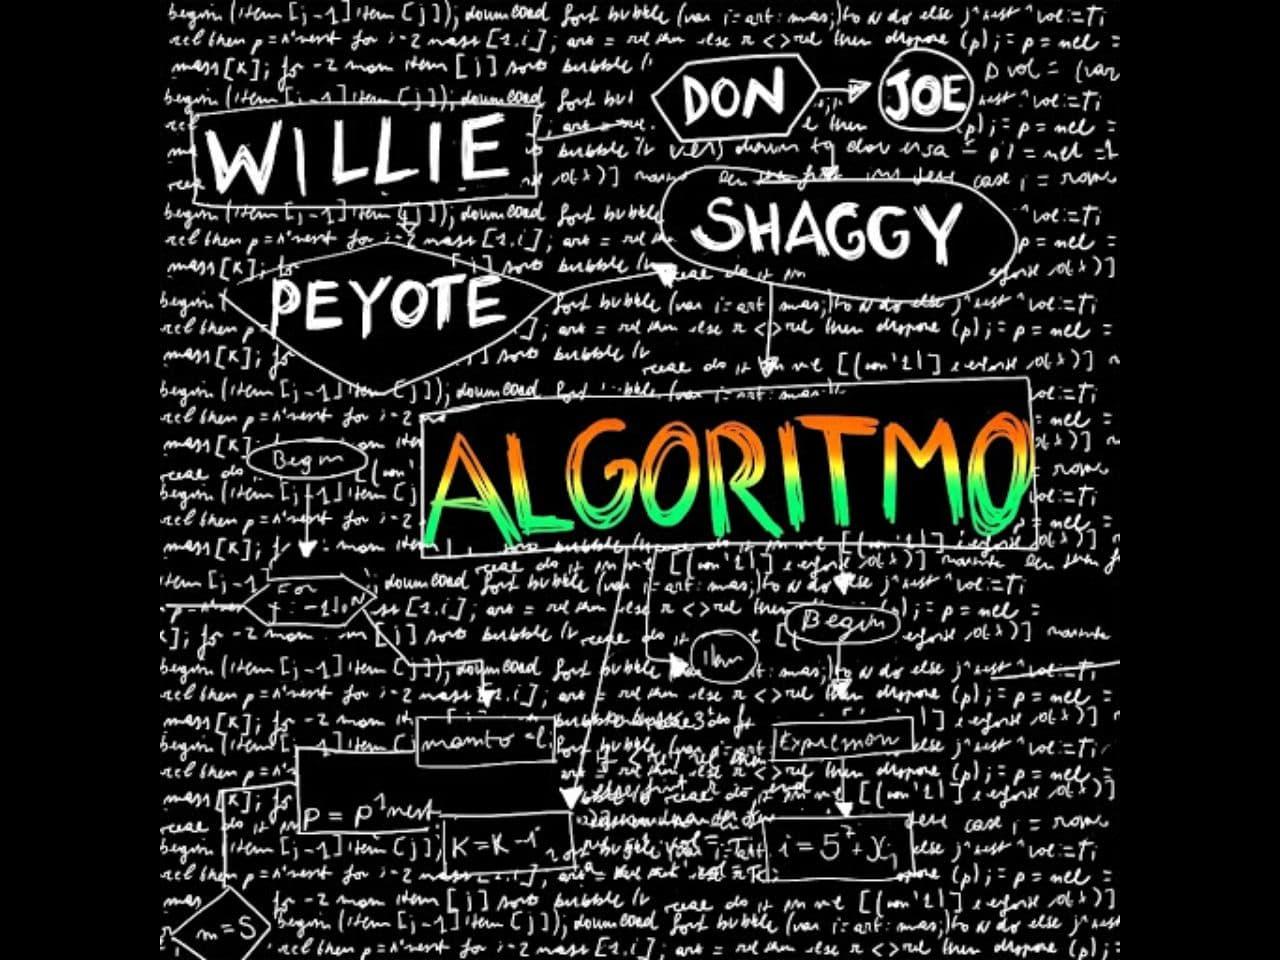 Willie Peyote Algoritmo